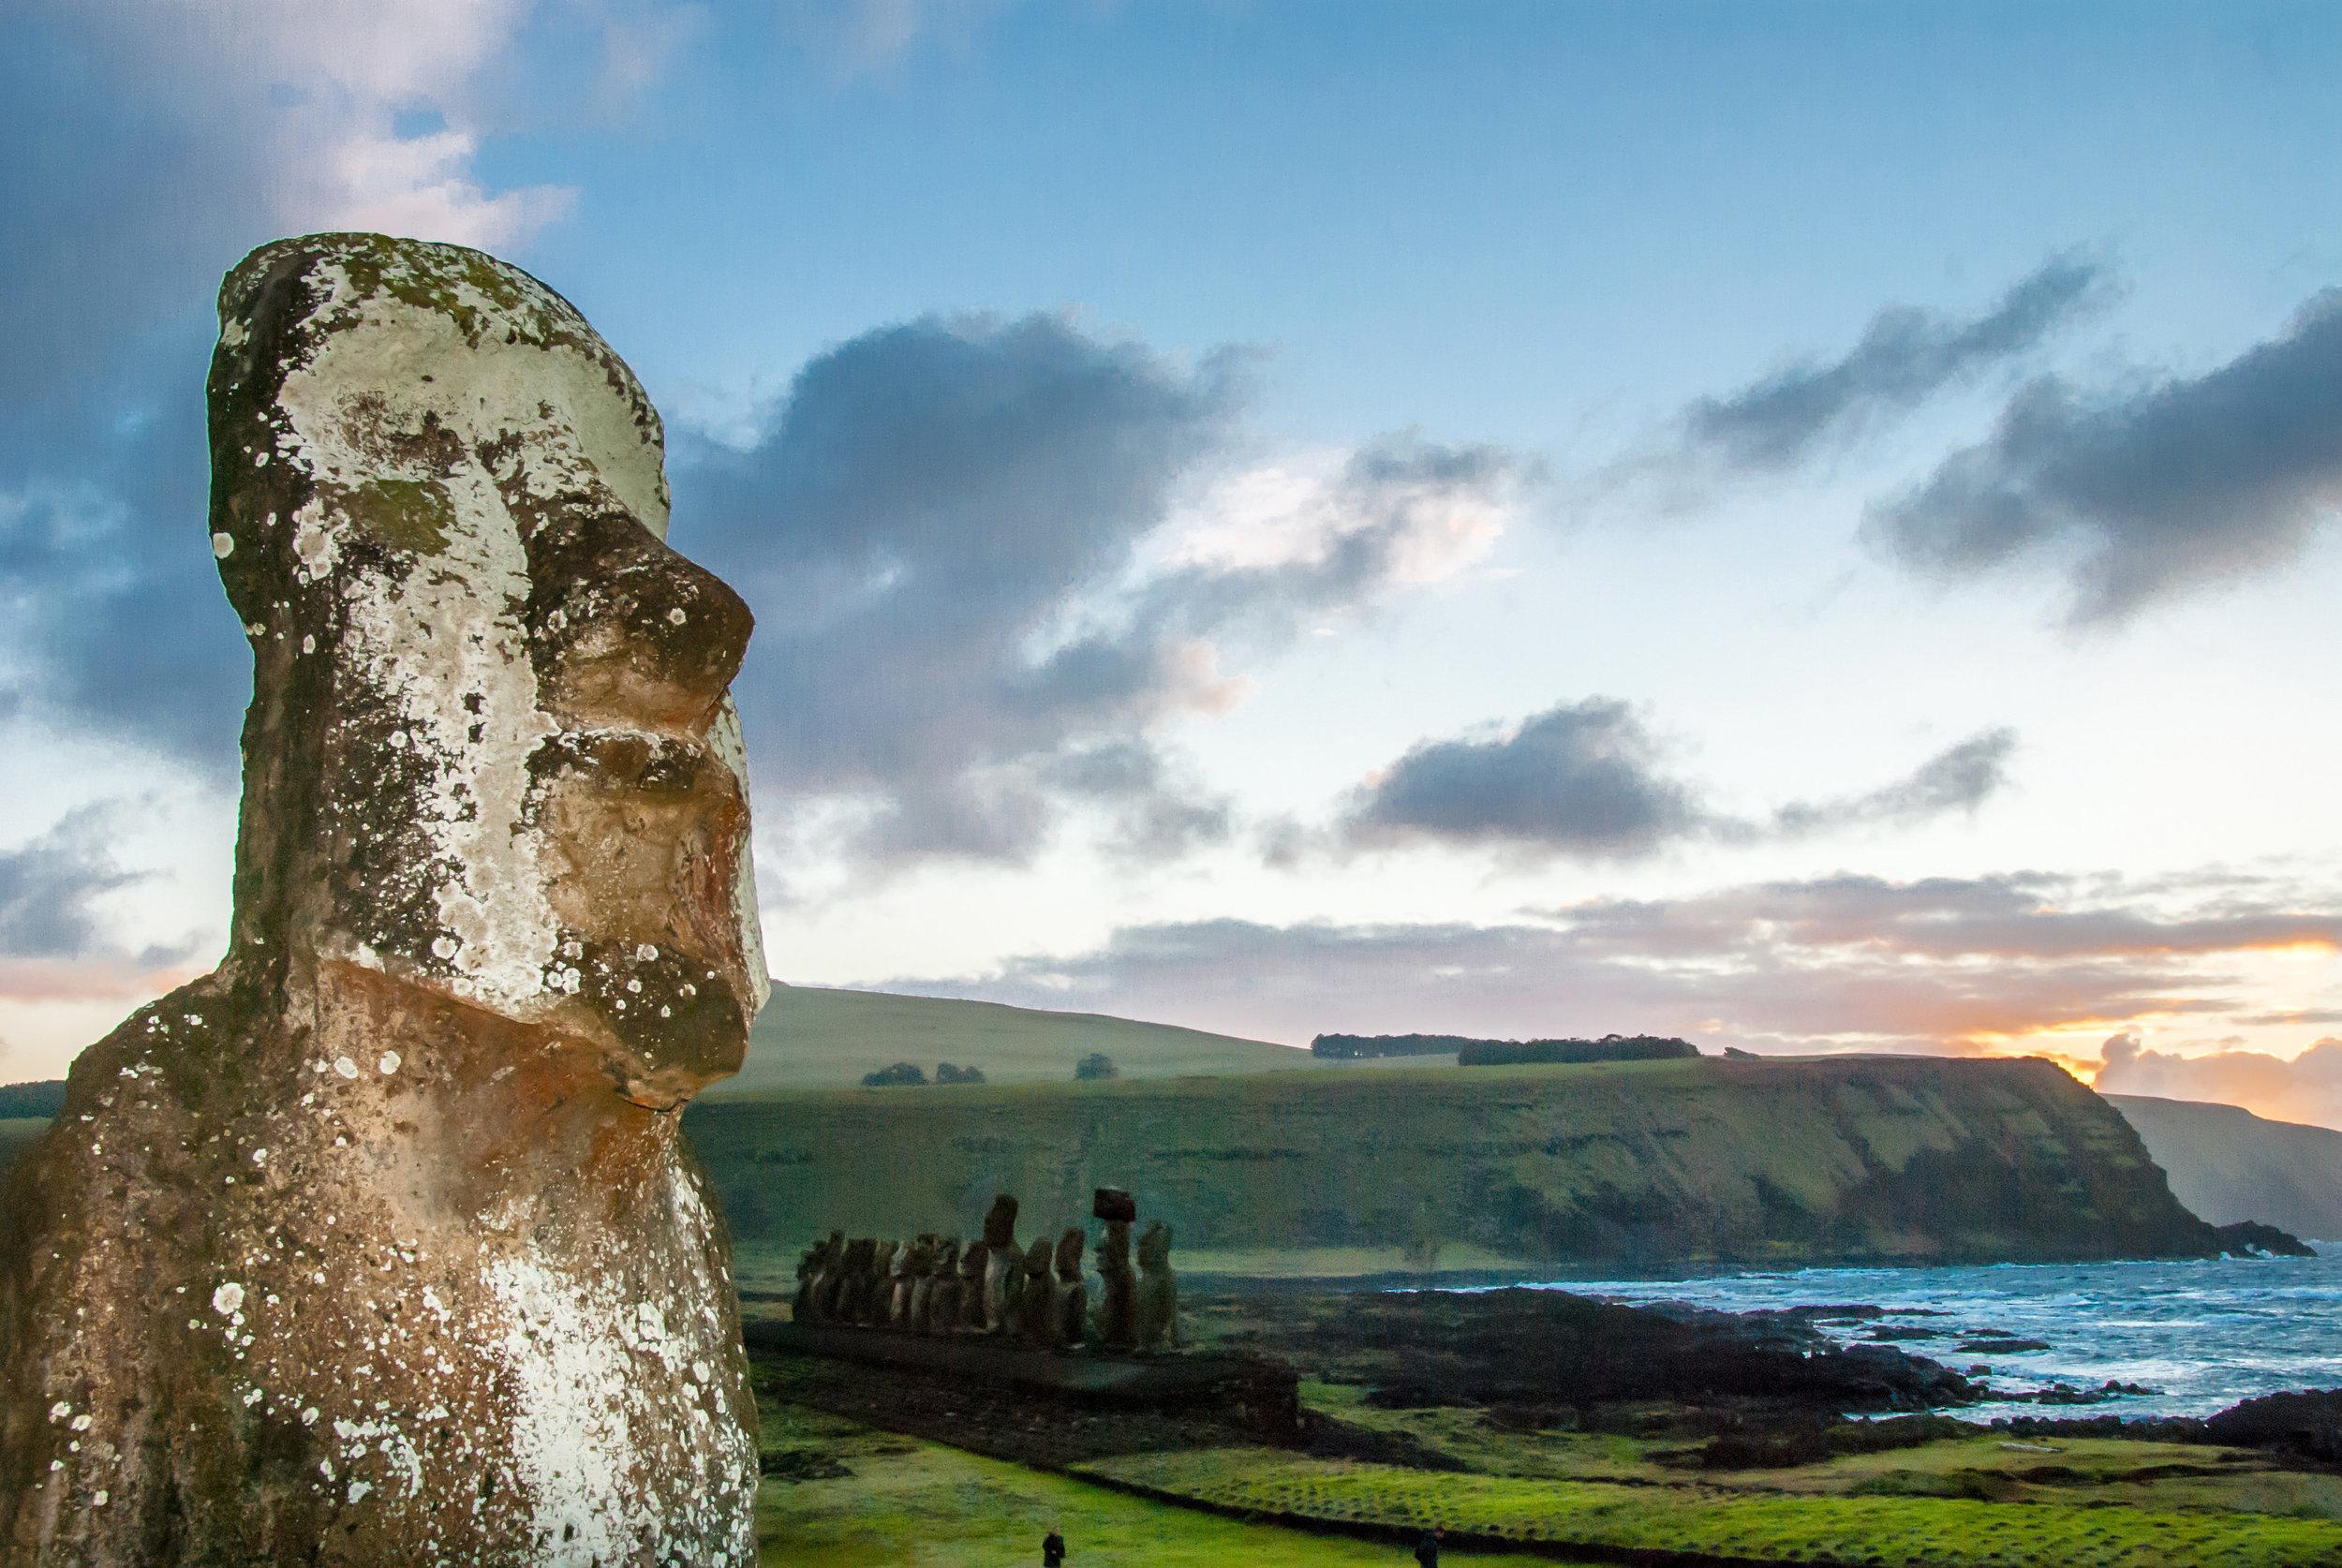 big-moai-and-sky-plus-landscape-easter-island-chile.jpg